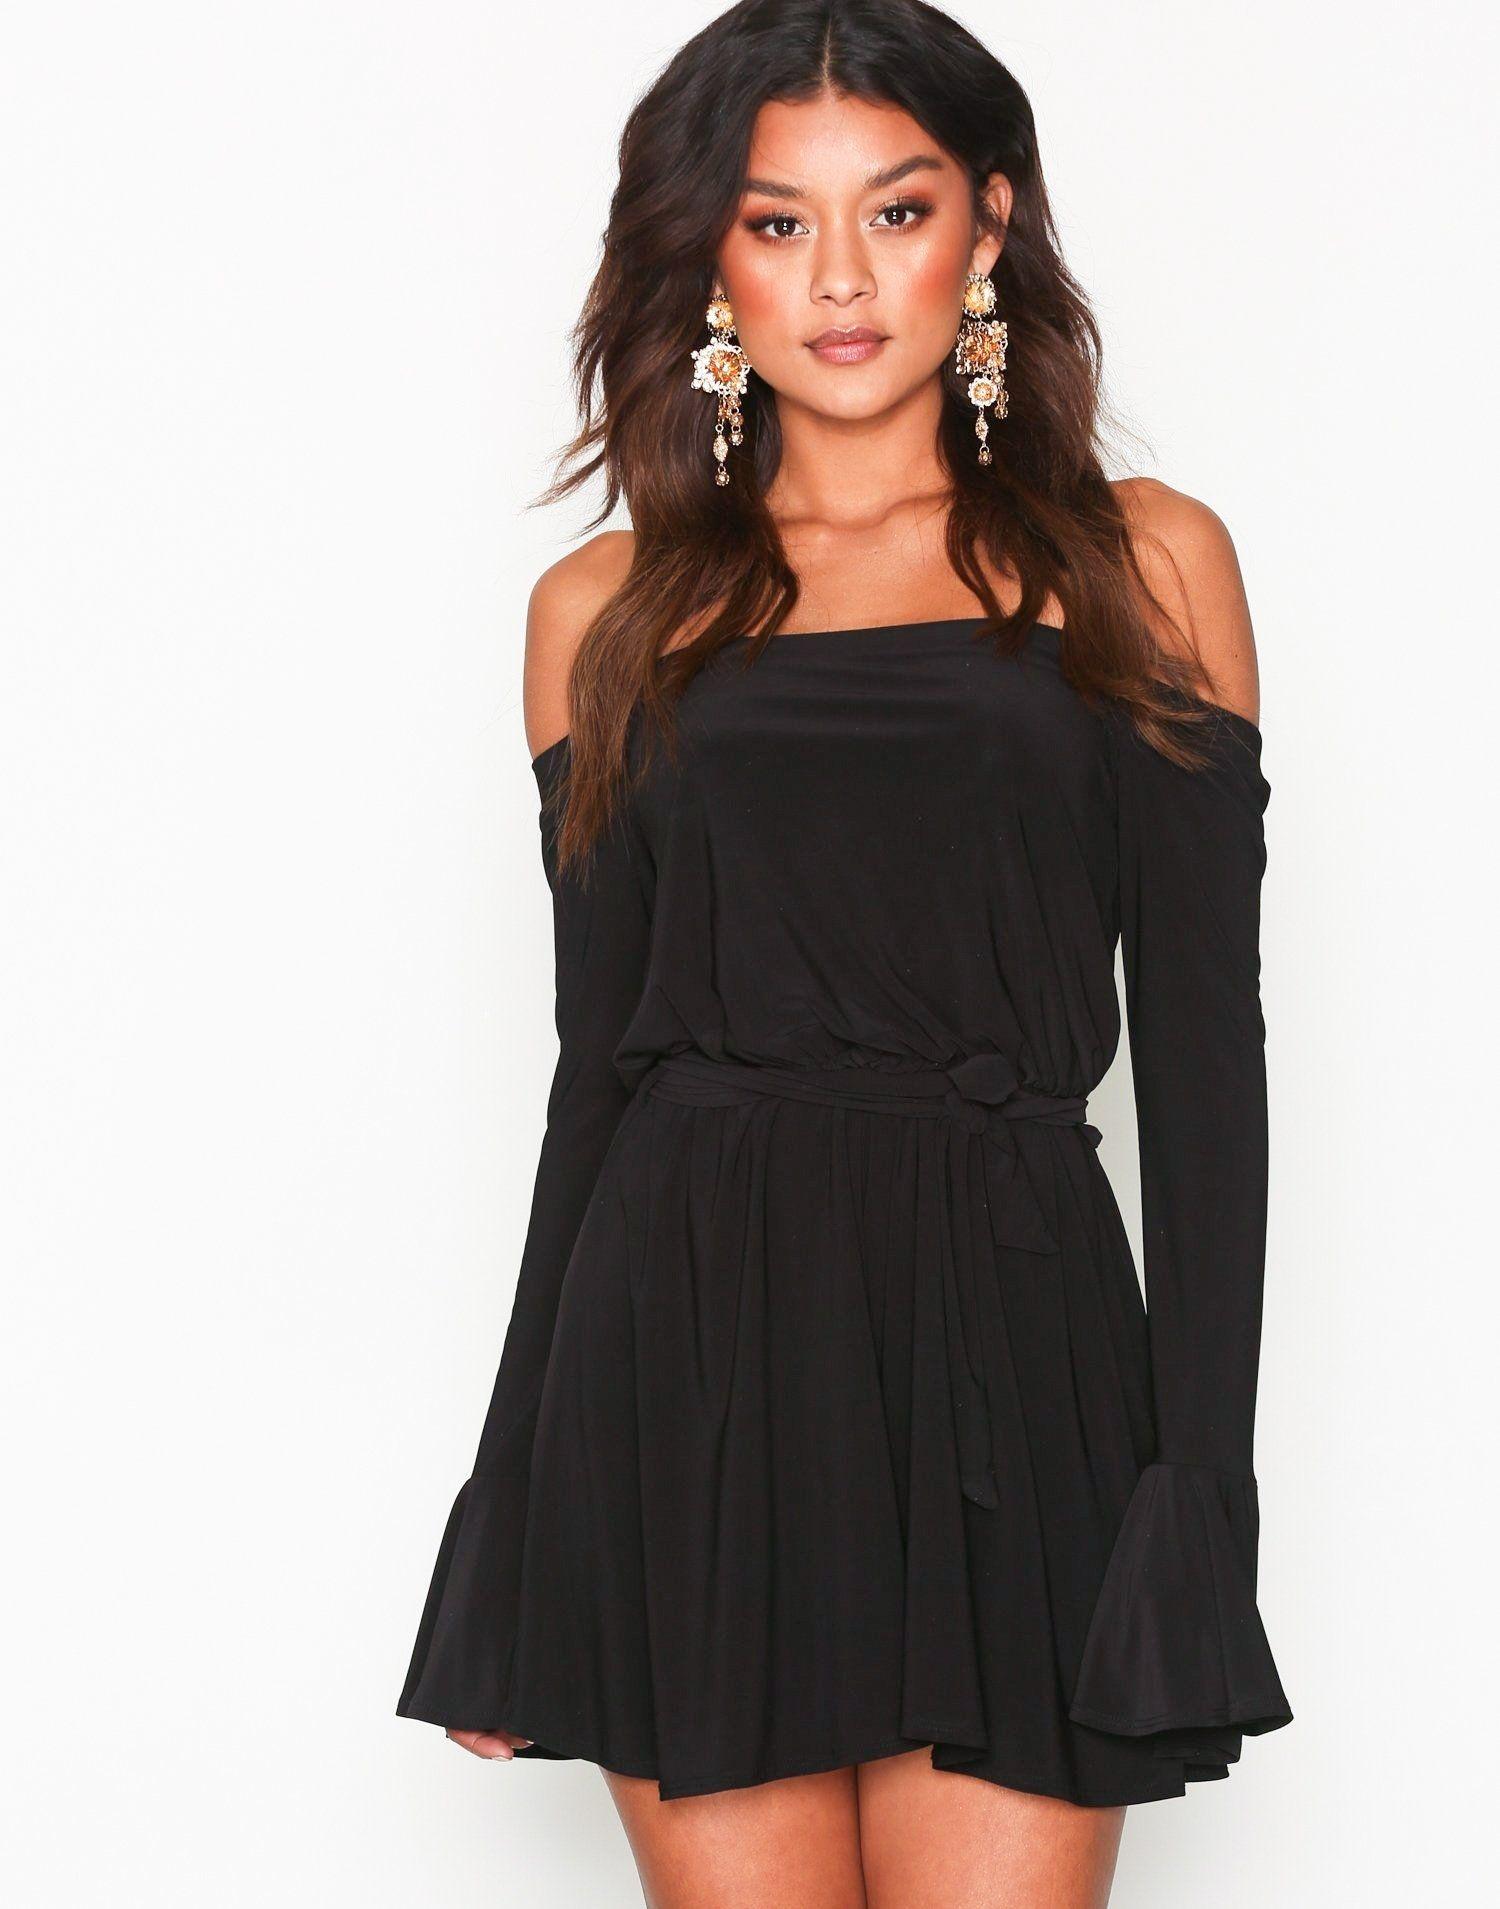 d5810c9d694 Off Shoulder Playsuit - Nly One - Black - Jumpsuits - Clothing - Women -  Nelly.com